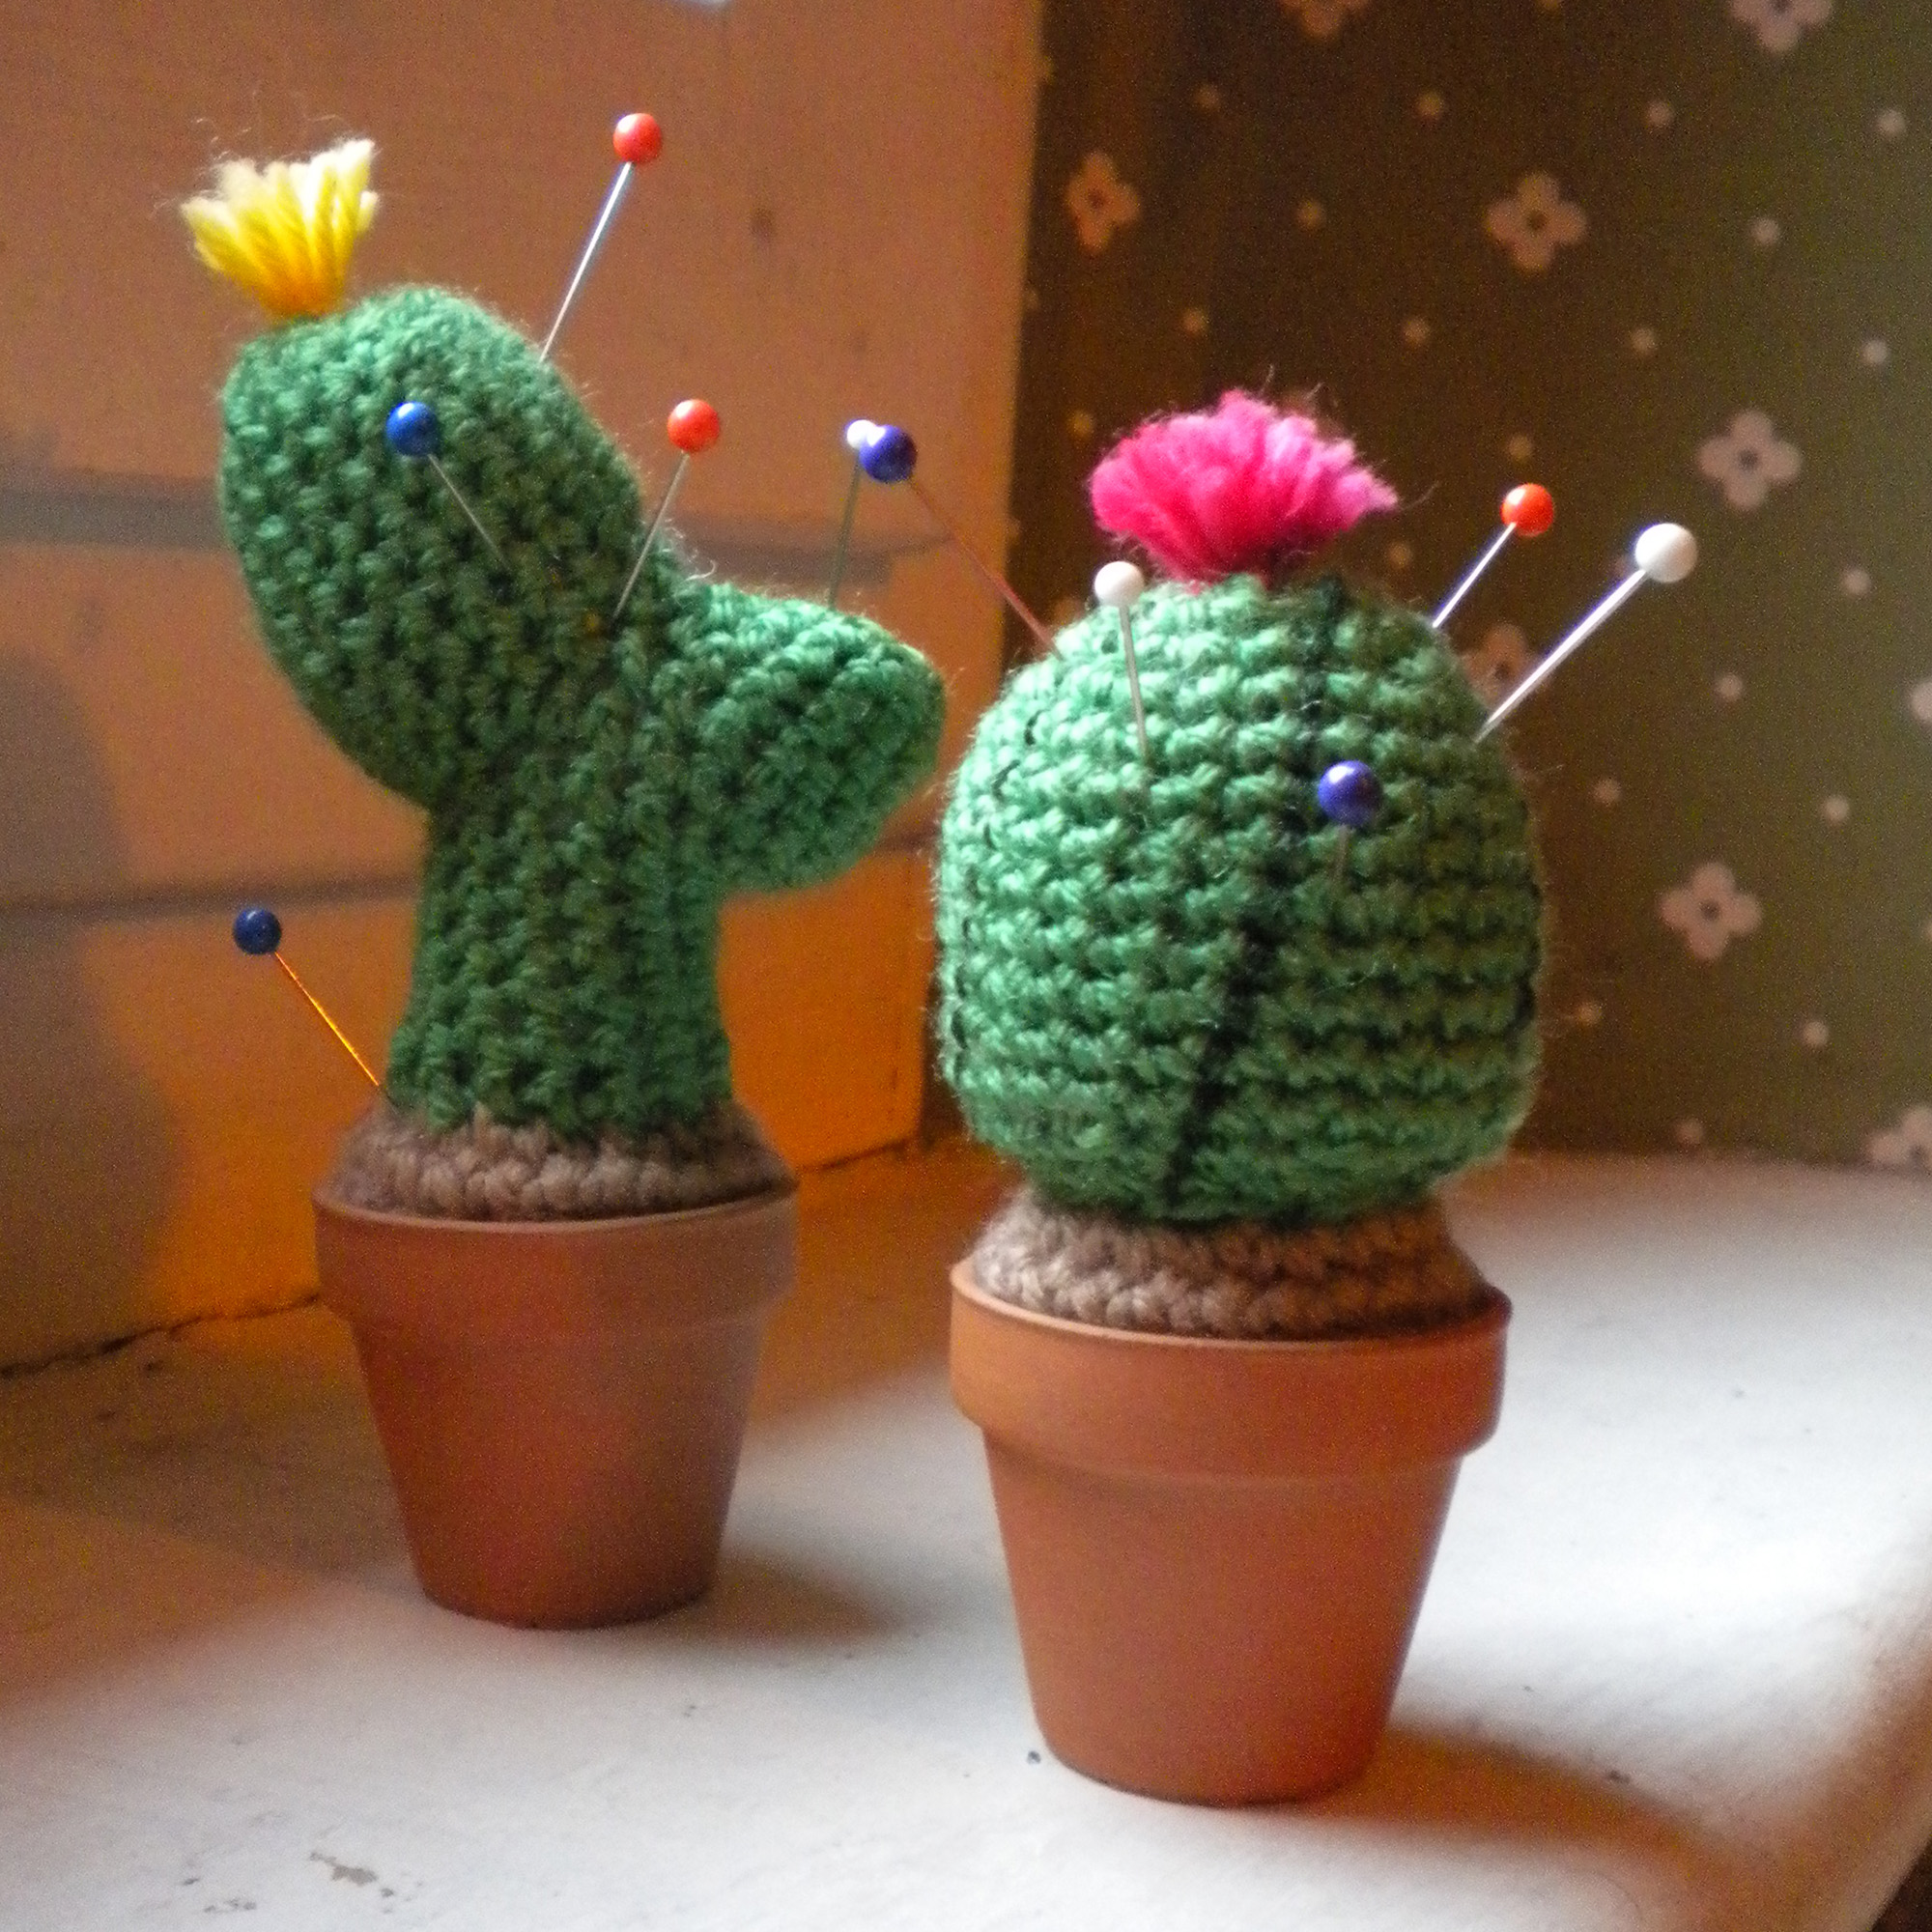 Still Vauriens Les cactus en crochet